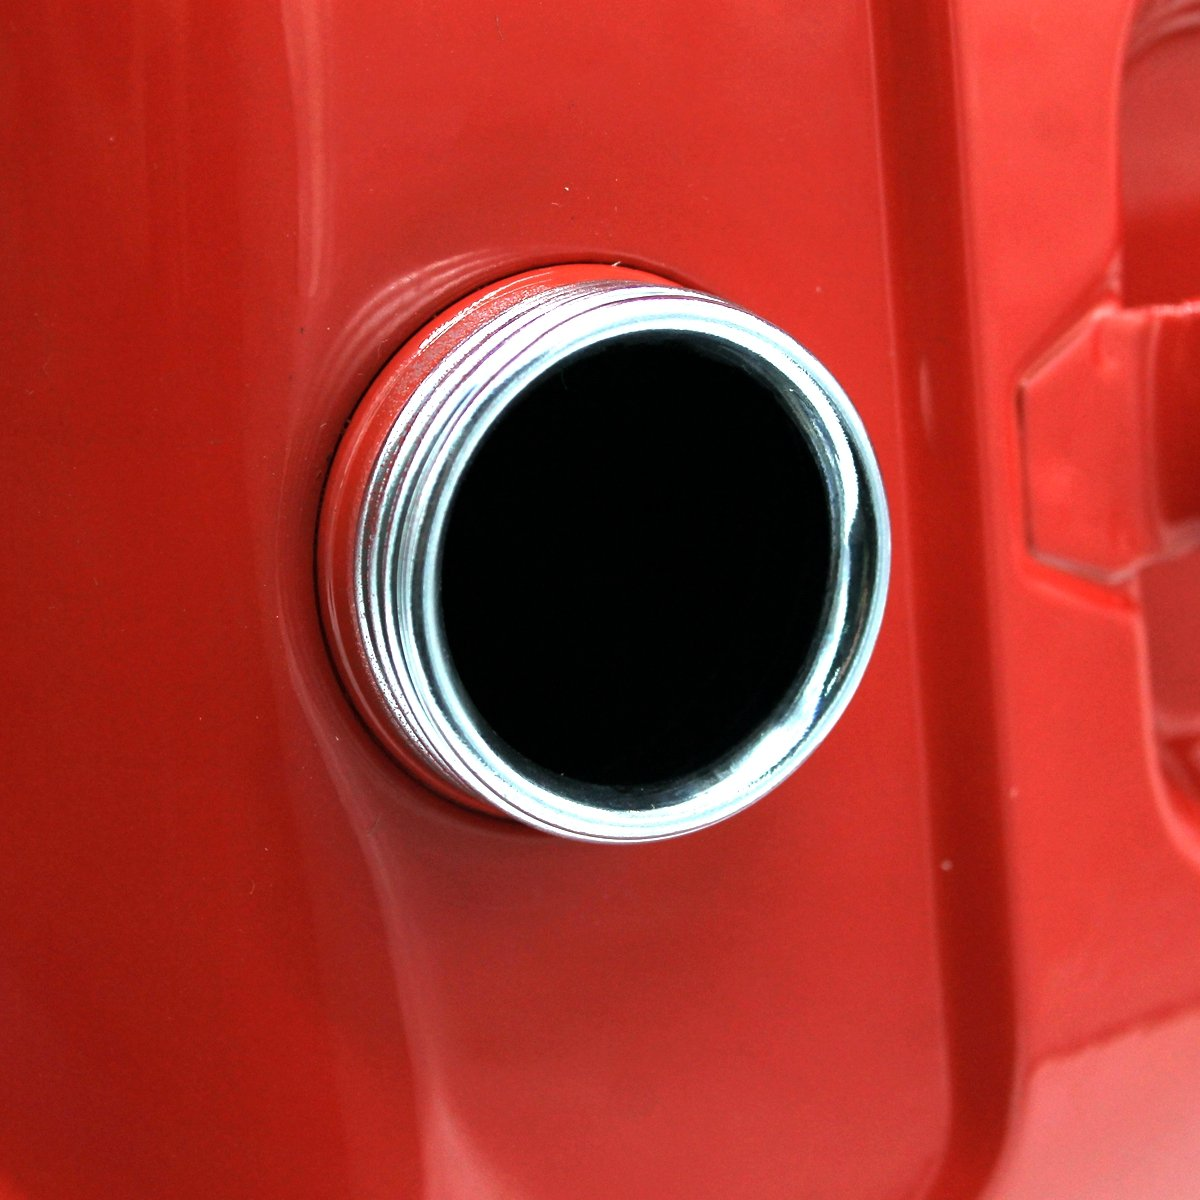 Amazon.com: IZTOSS Gallon - Depósito de gasolina portátil de ...